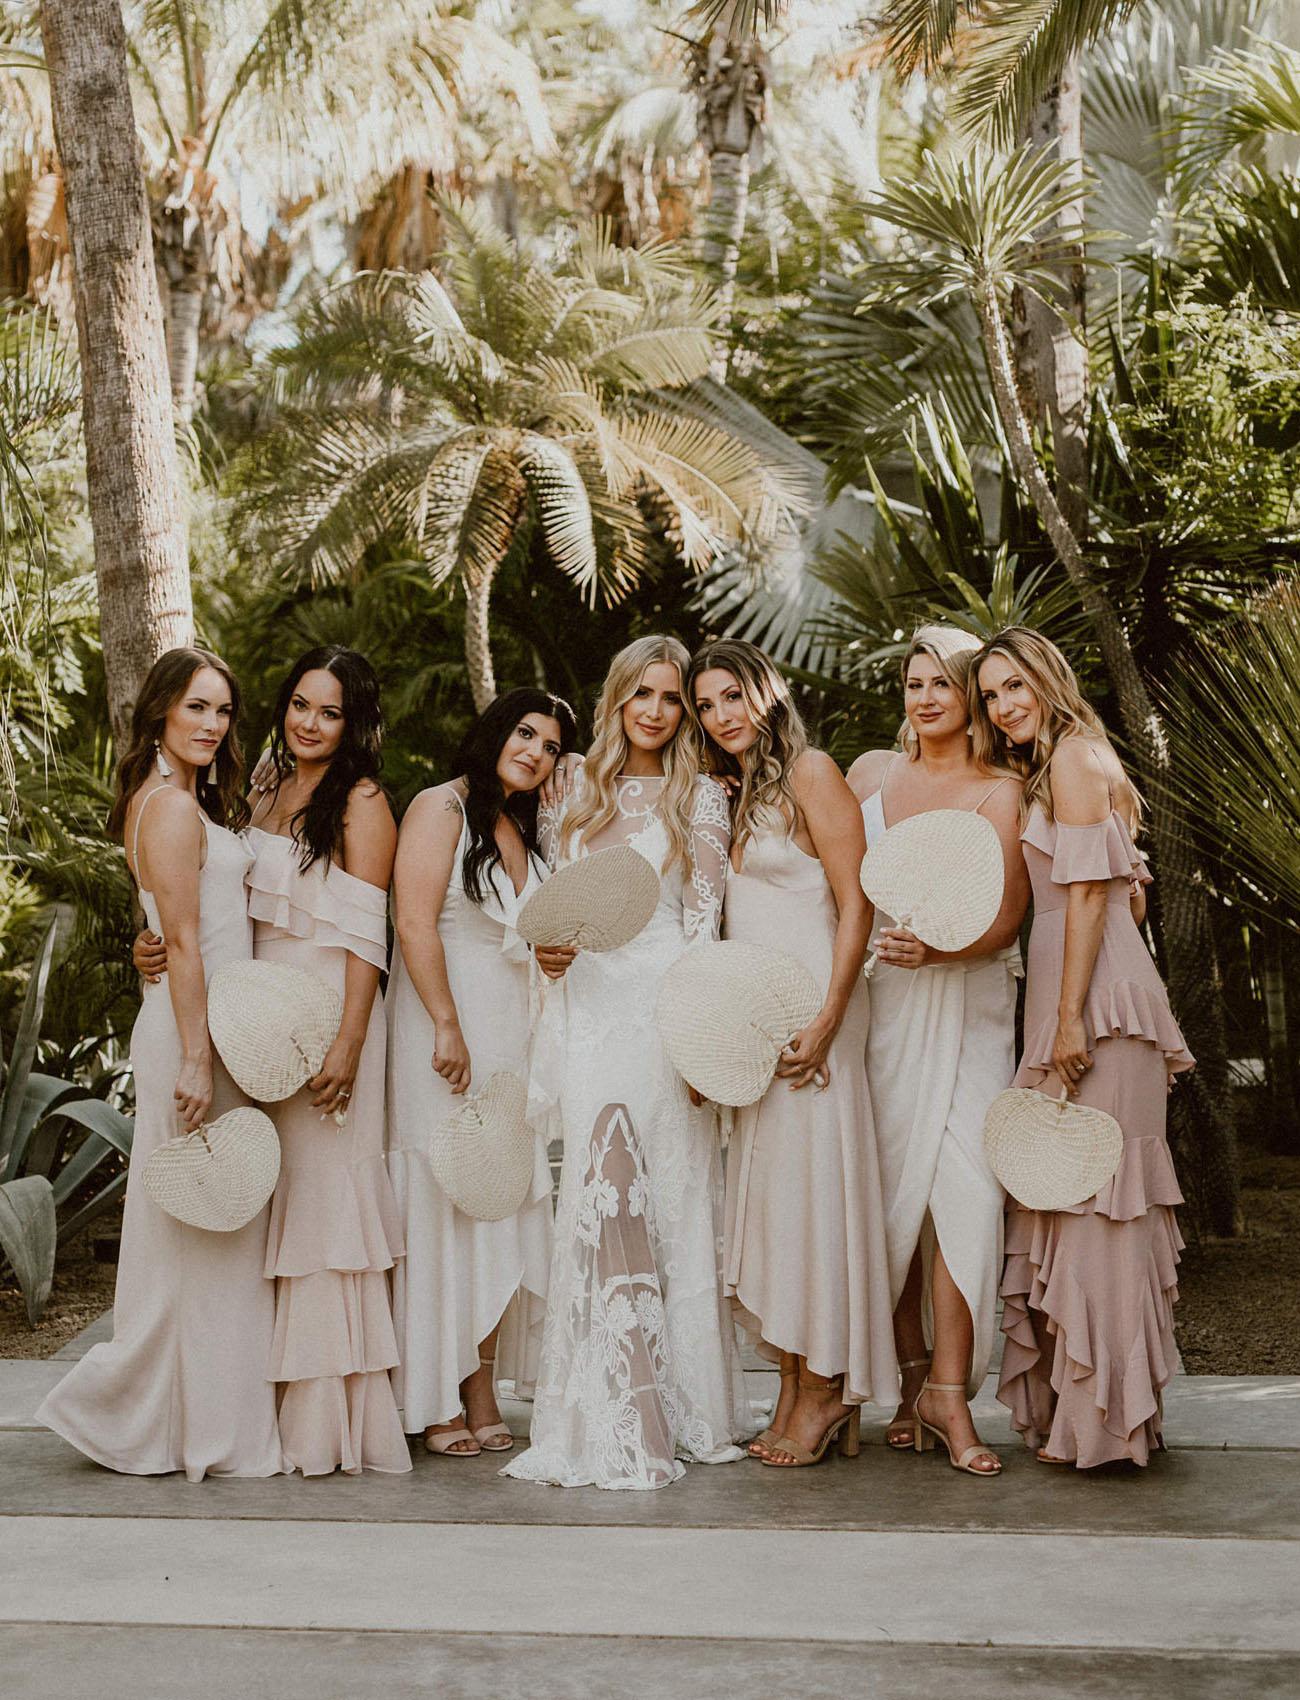 blush bridesmaids dresses